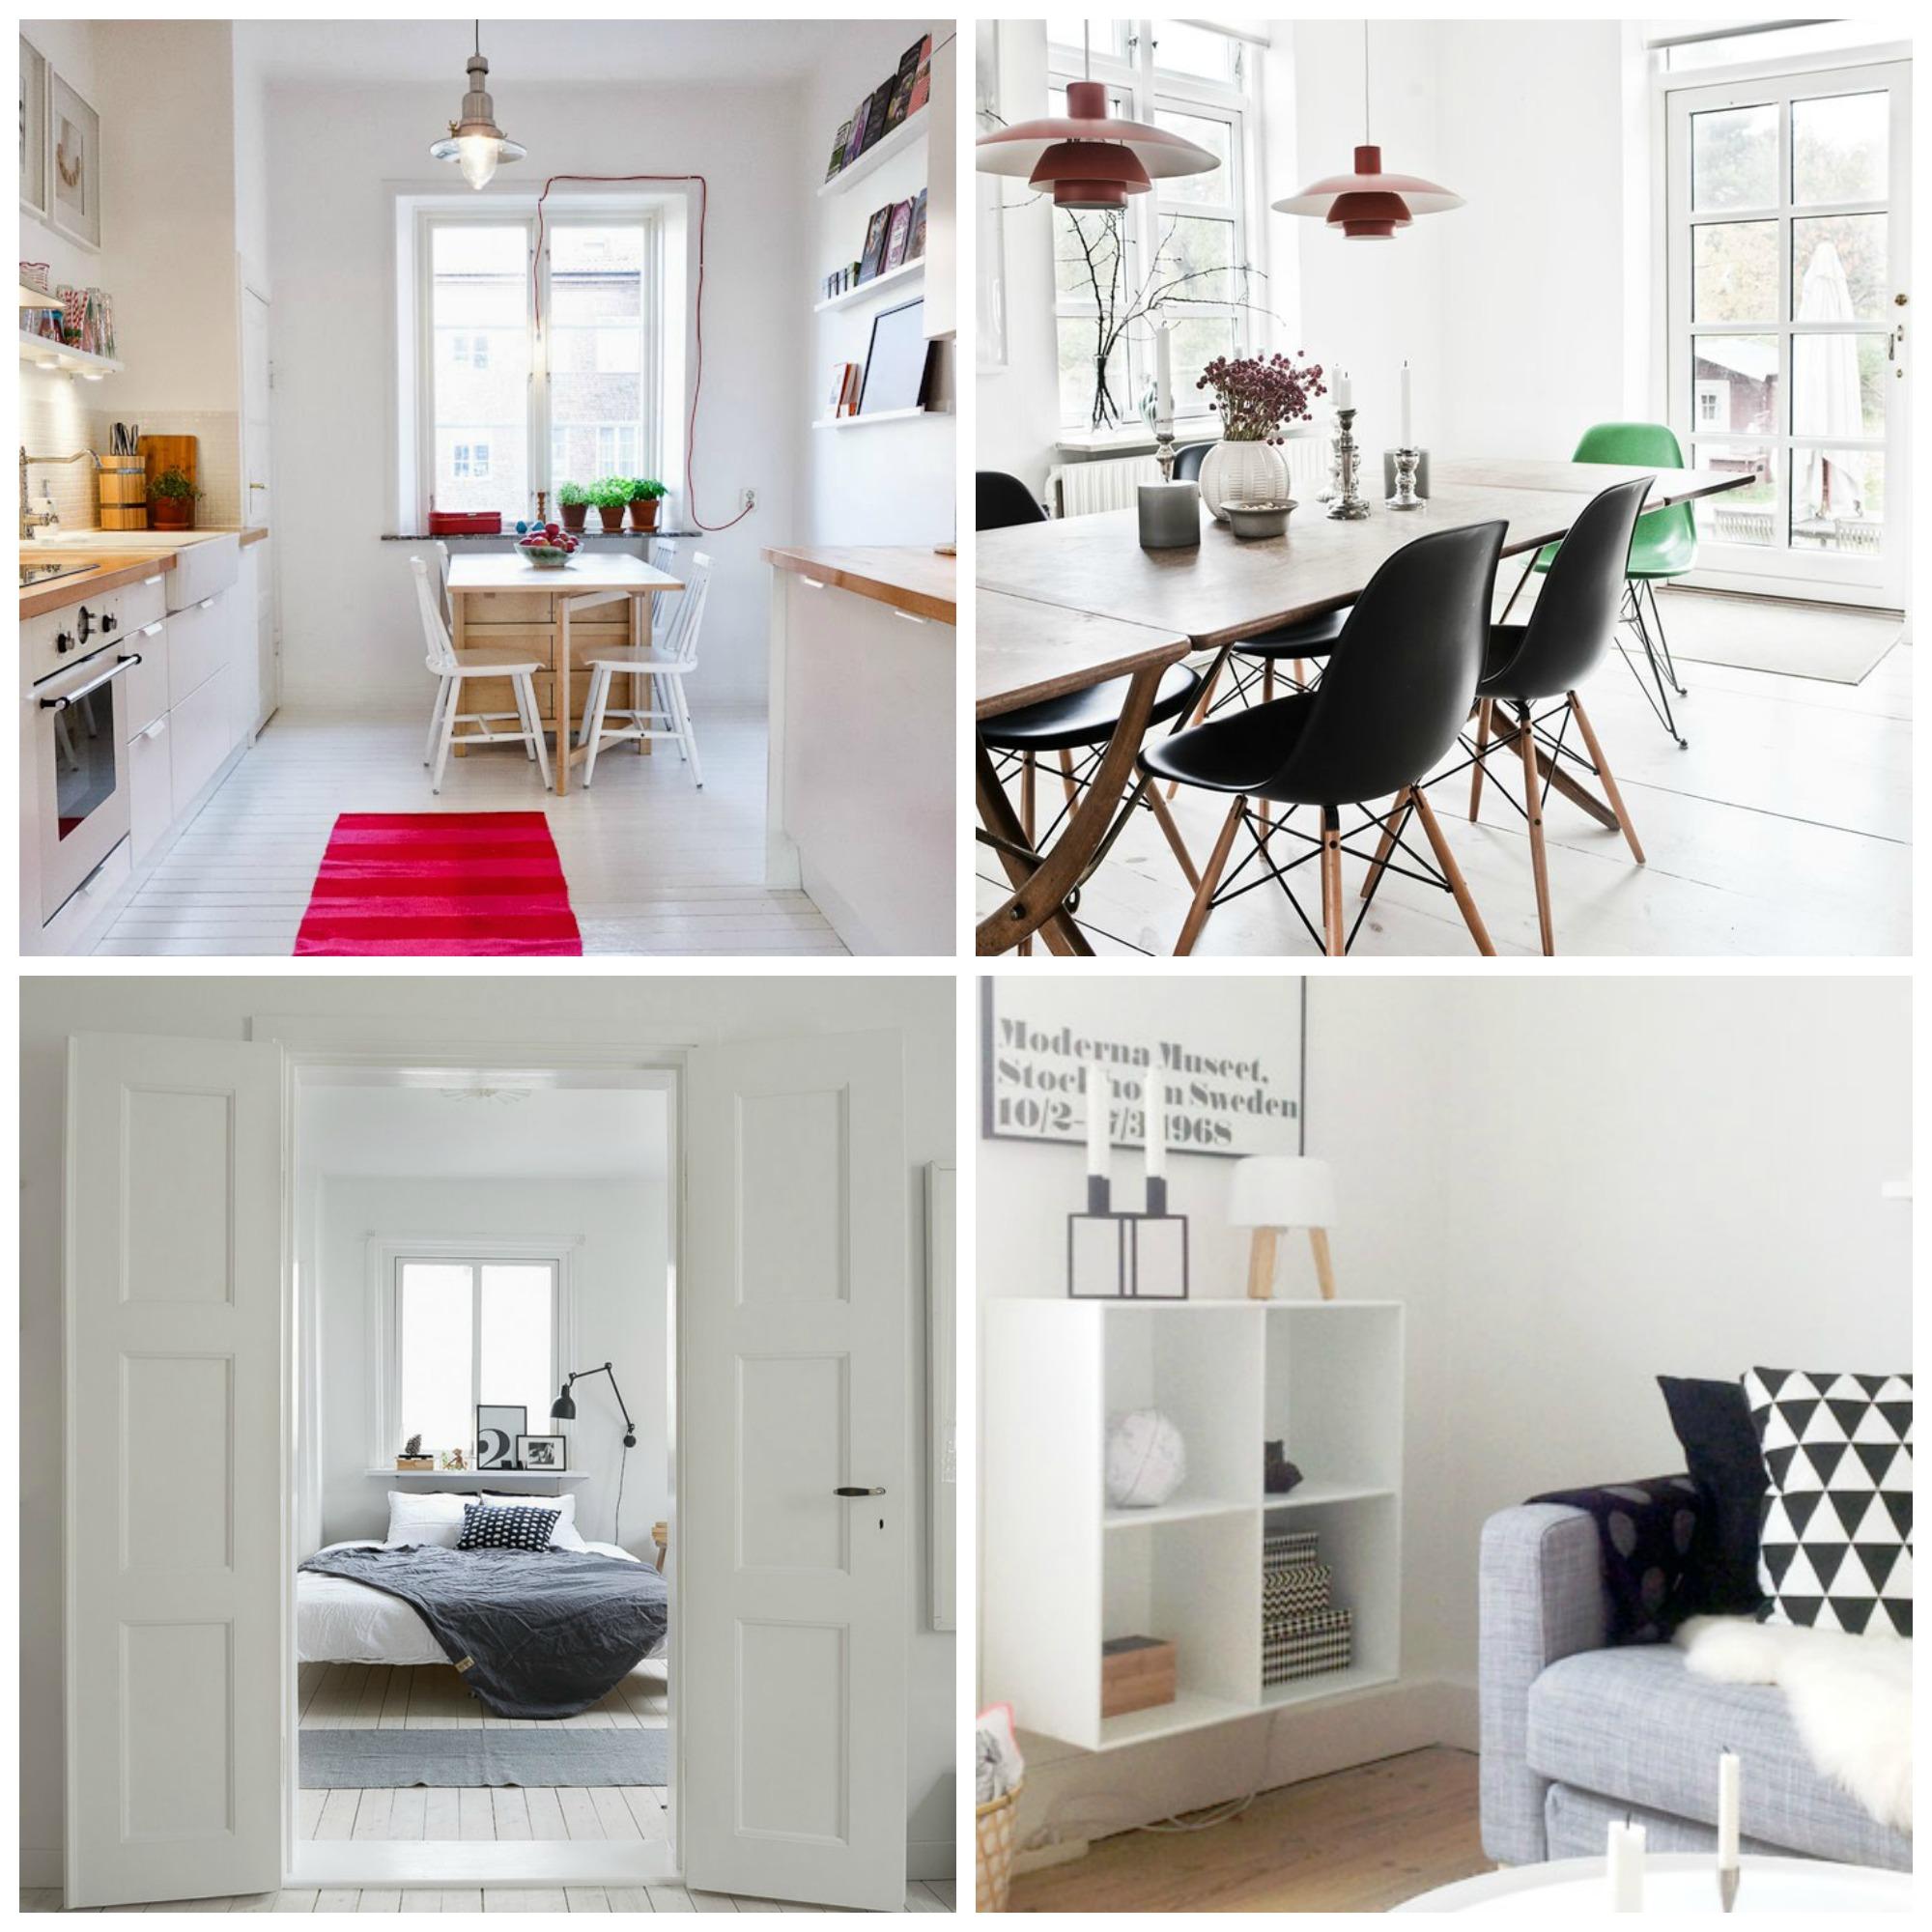 Why I love Danish apartments | Dejlige Days